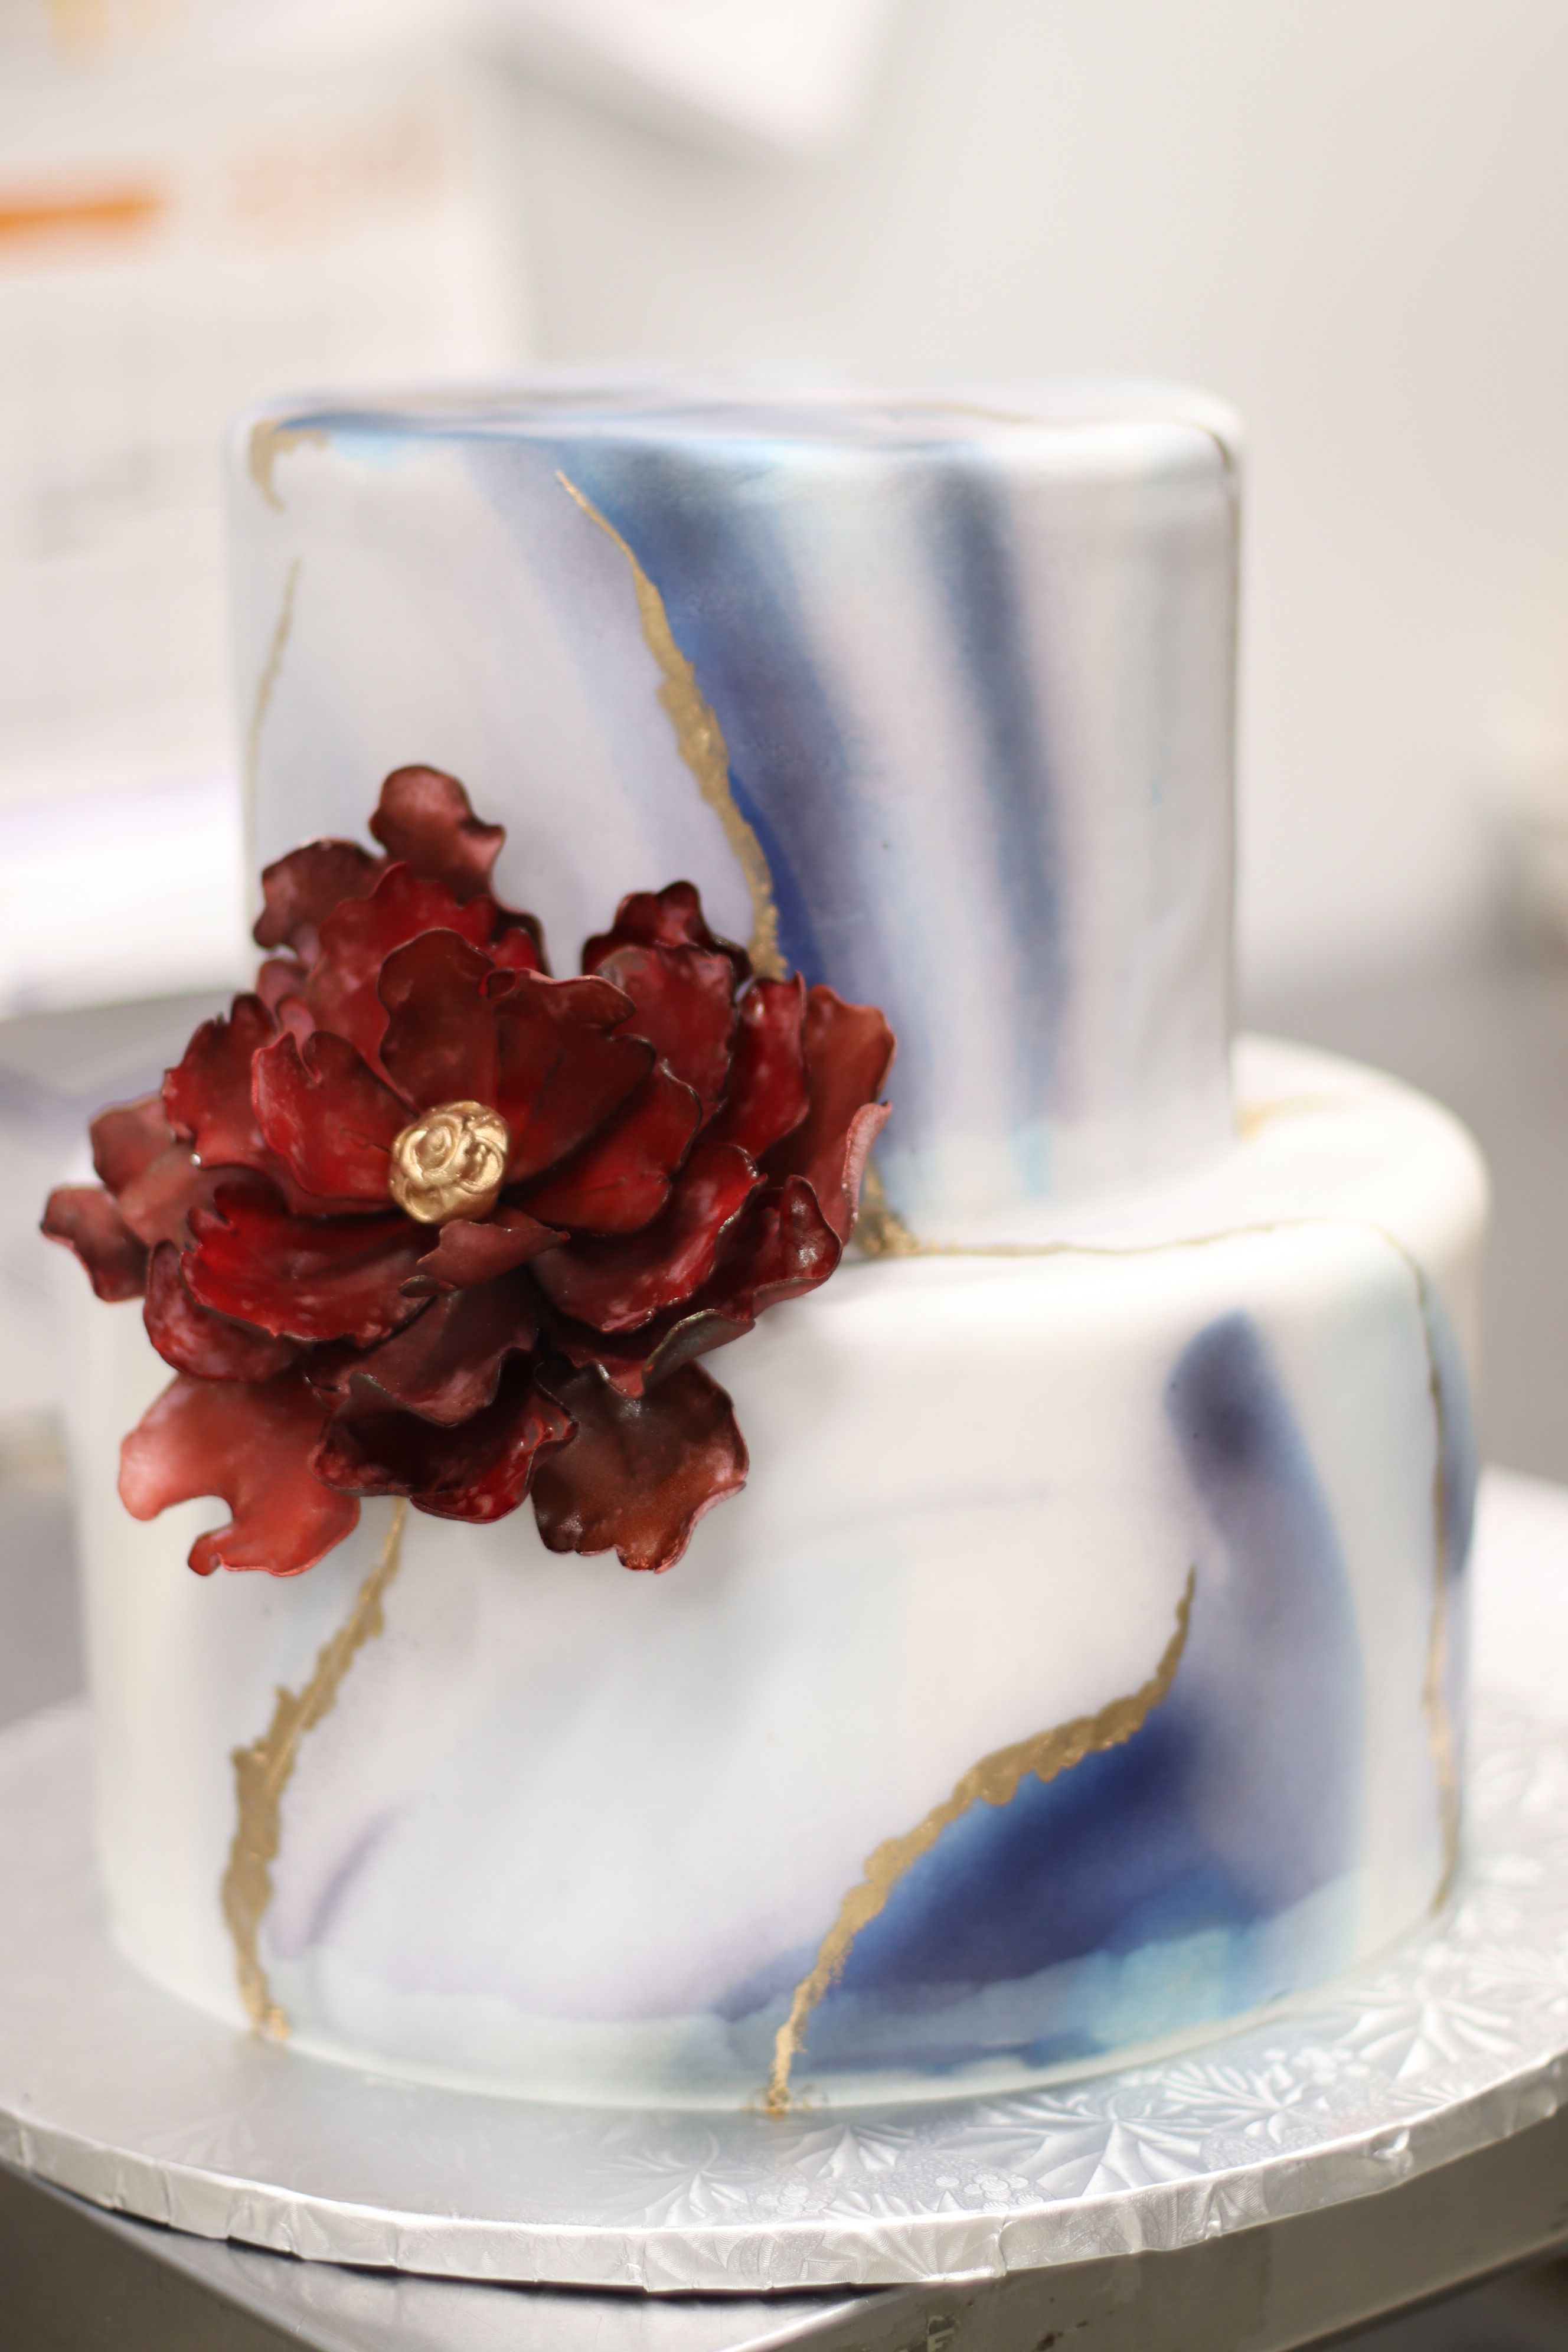 Astounding A Little Cake Custom Birthday Cakes Wedding Cakes Nj Nyc Funny Birthday Cards Online Bapapcheapnameinfo